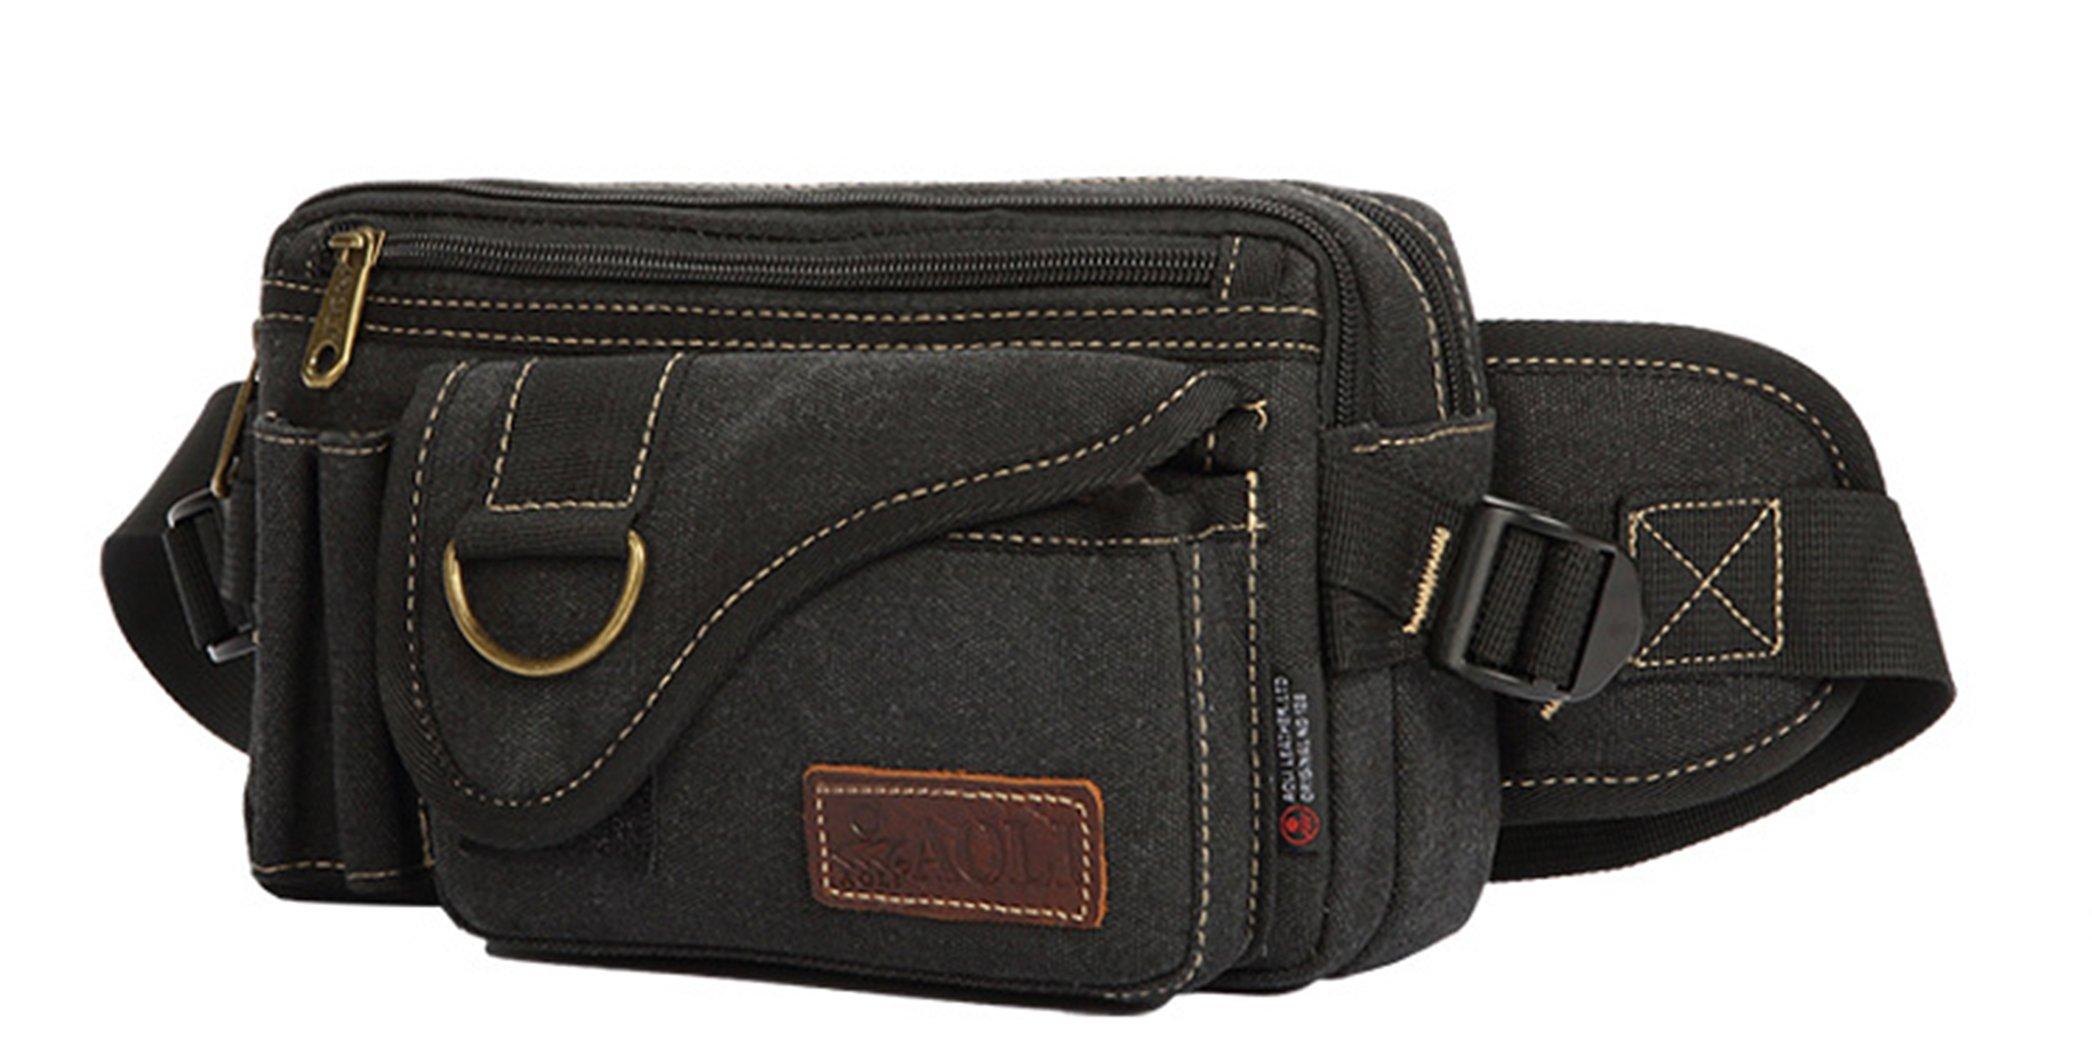 JiaYou Unisex Sports Waist Bag Fanny Hip Pack Bum Bag(Black A,3L)